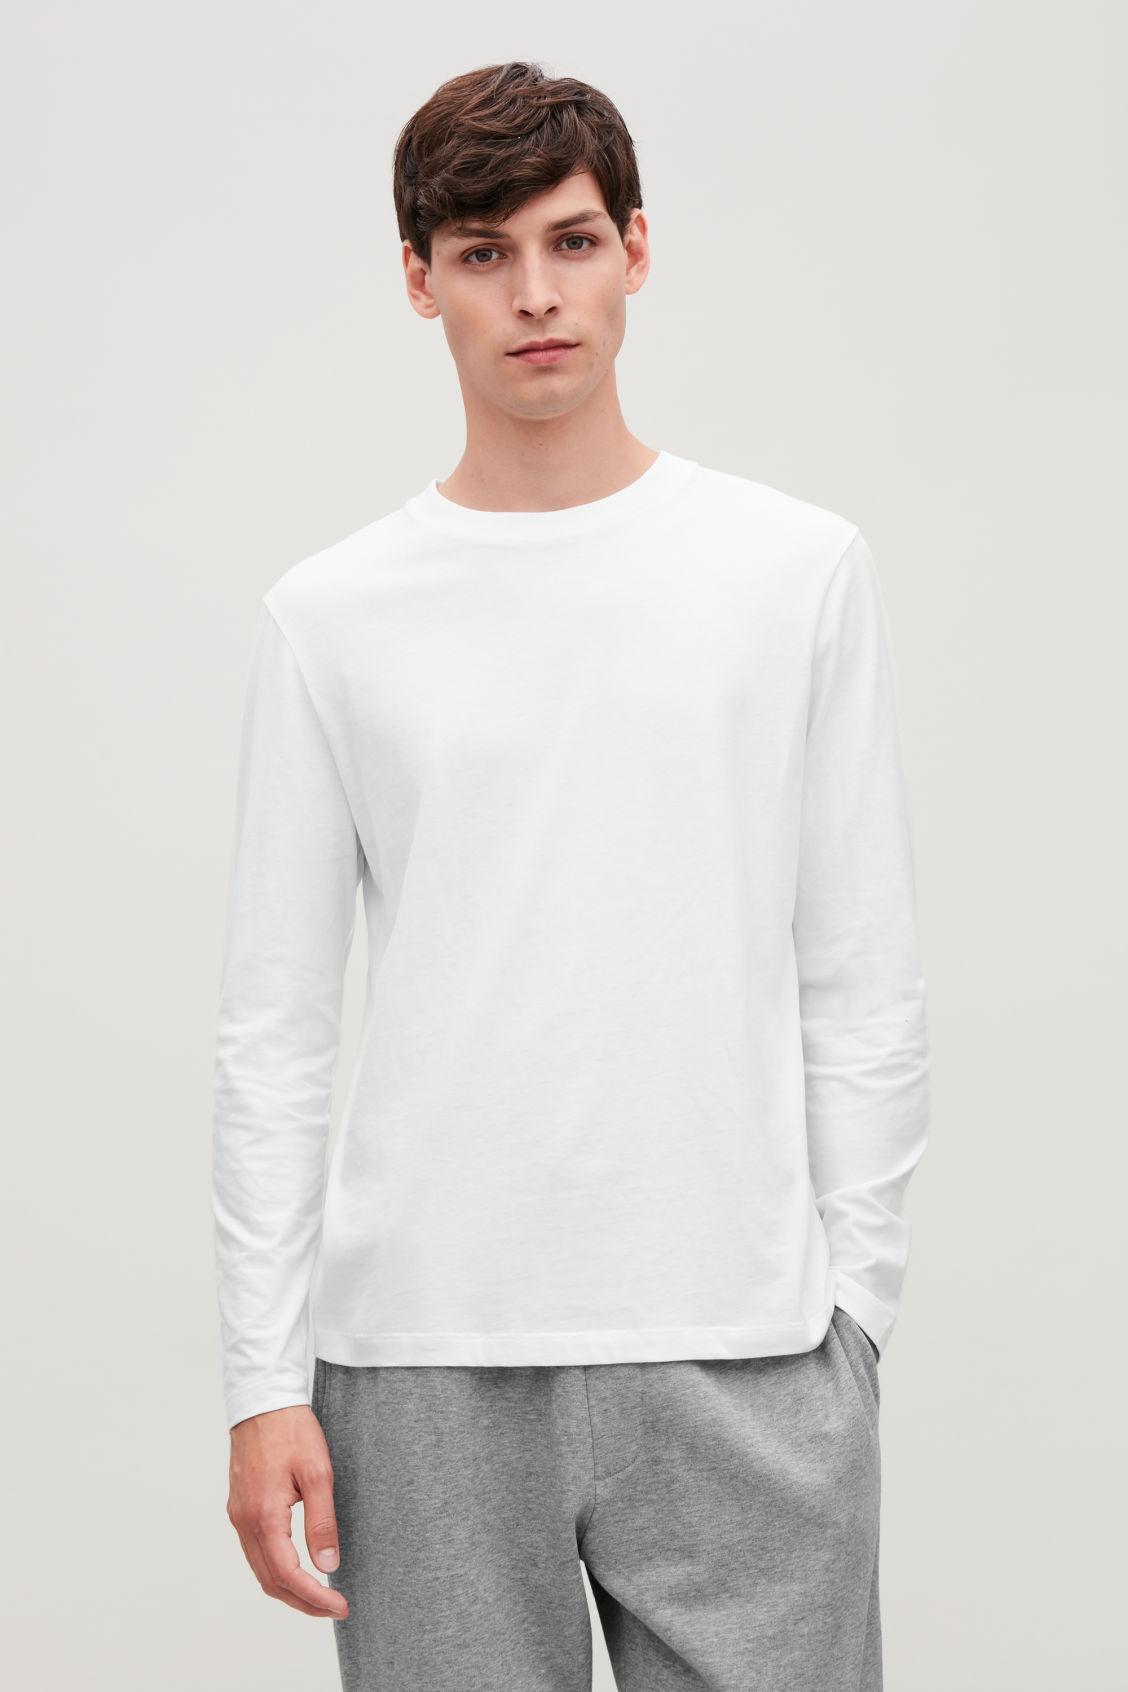 Long sleeved cotton t shirt white long sleeve t shirts for White cotton long sleeve t shirt